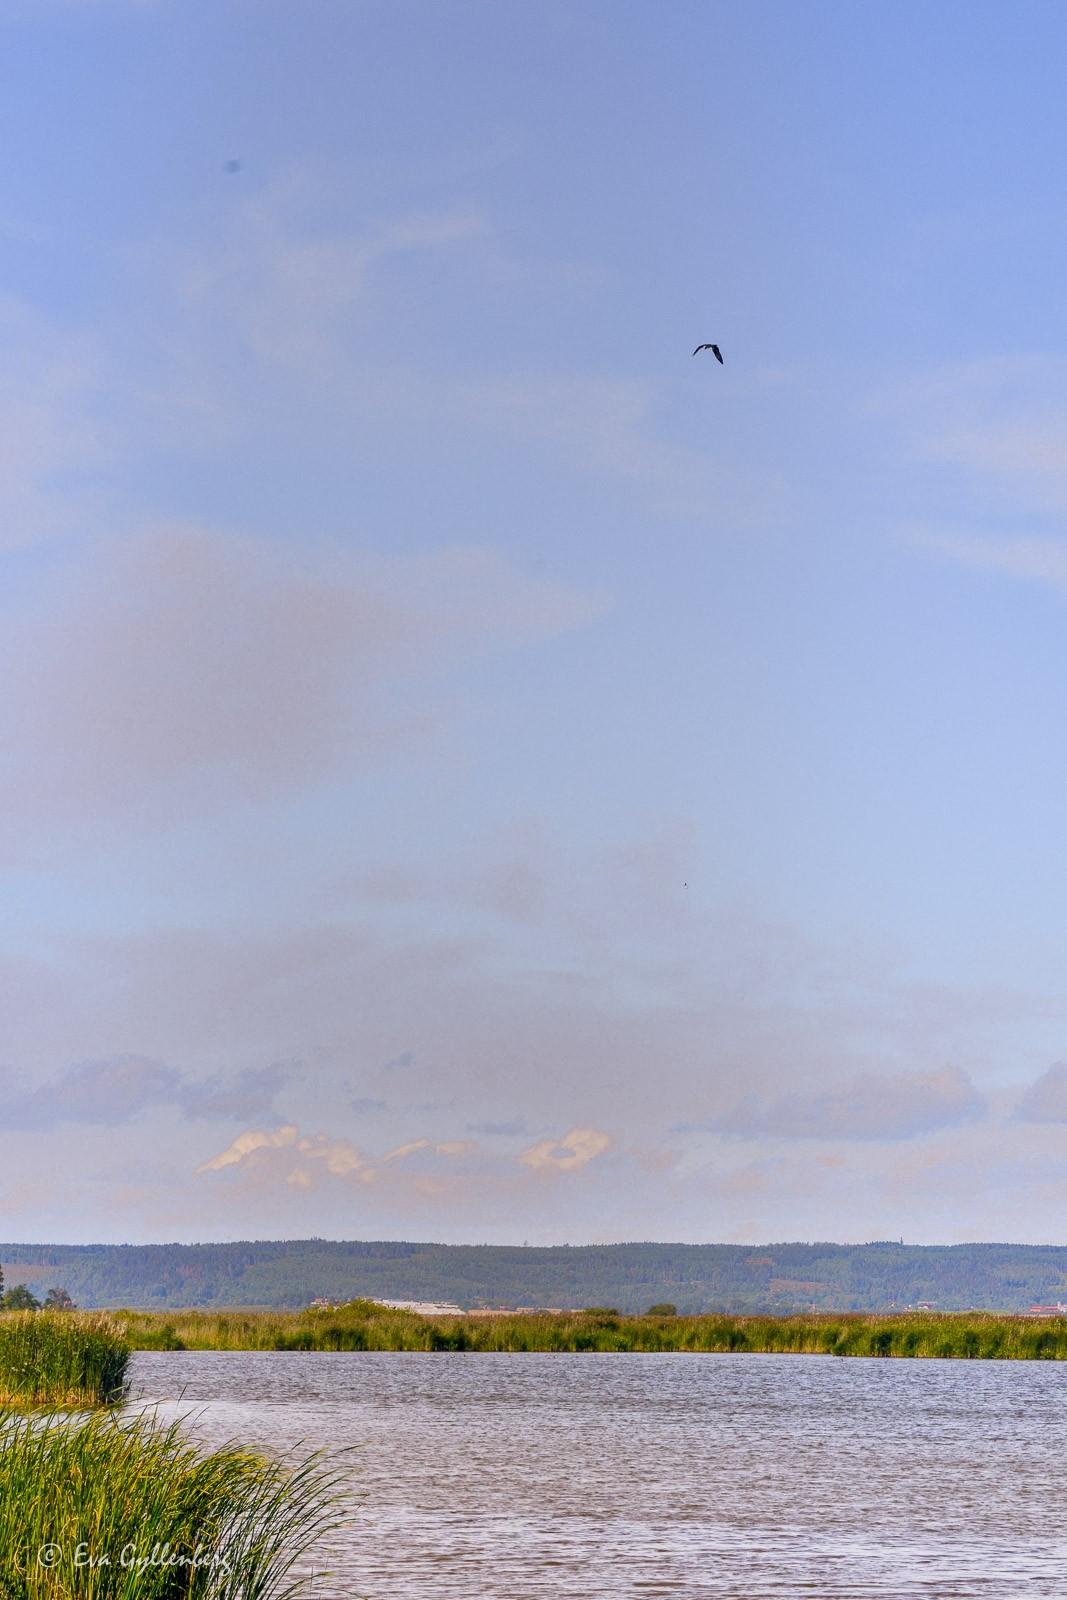 Rovfågel vid Tåkern